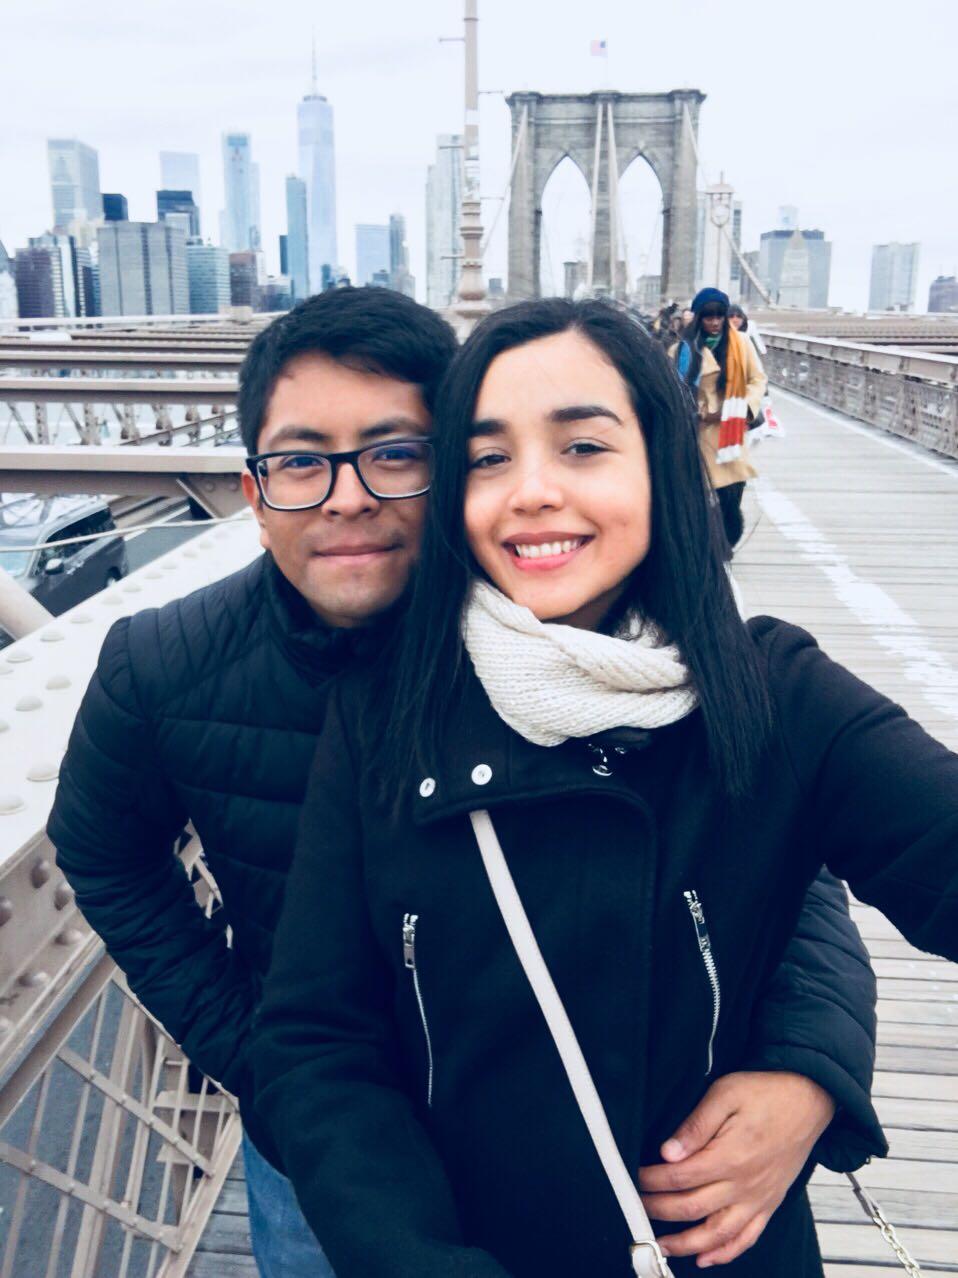 eduardo and paulina pose on the brooklyn bridge